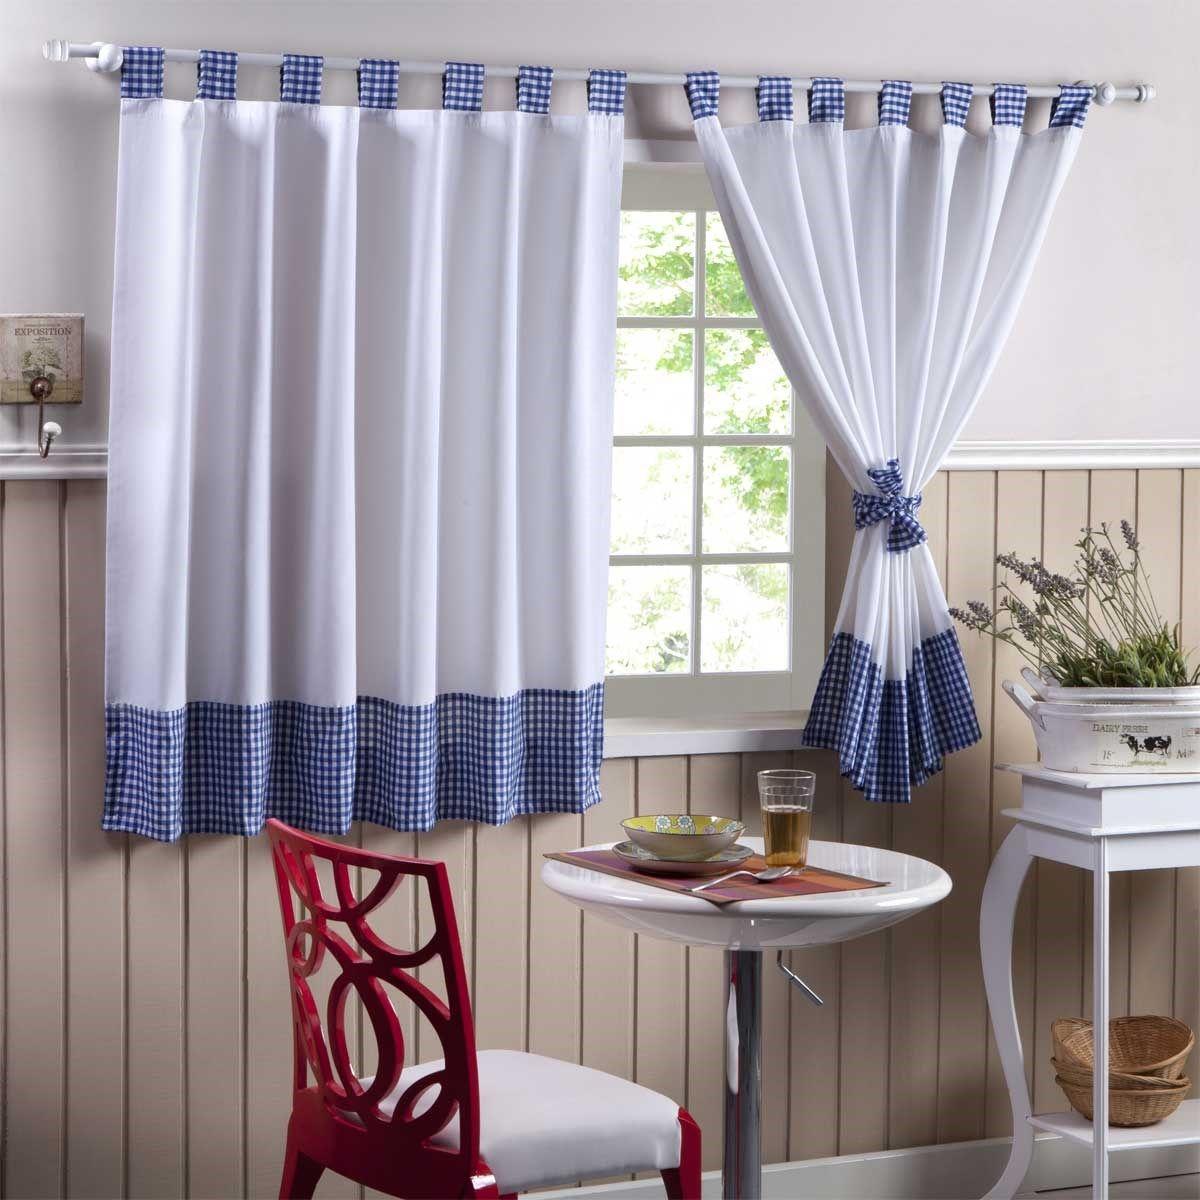 Cortina Para Cozinha Siena 2 00×1 20m Havan Havan Curtains